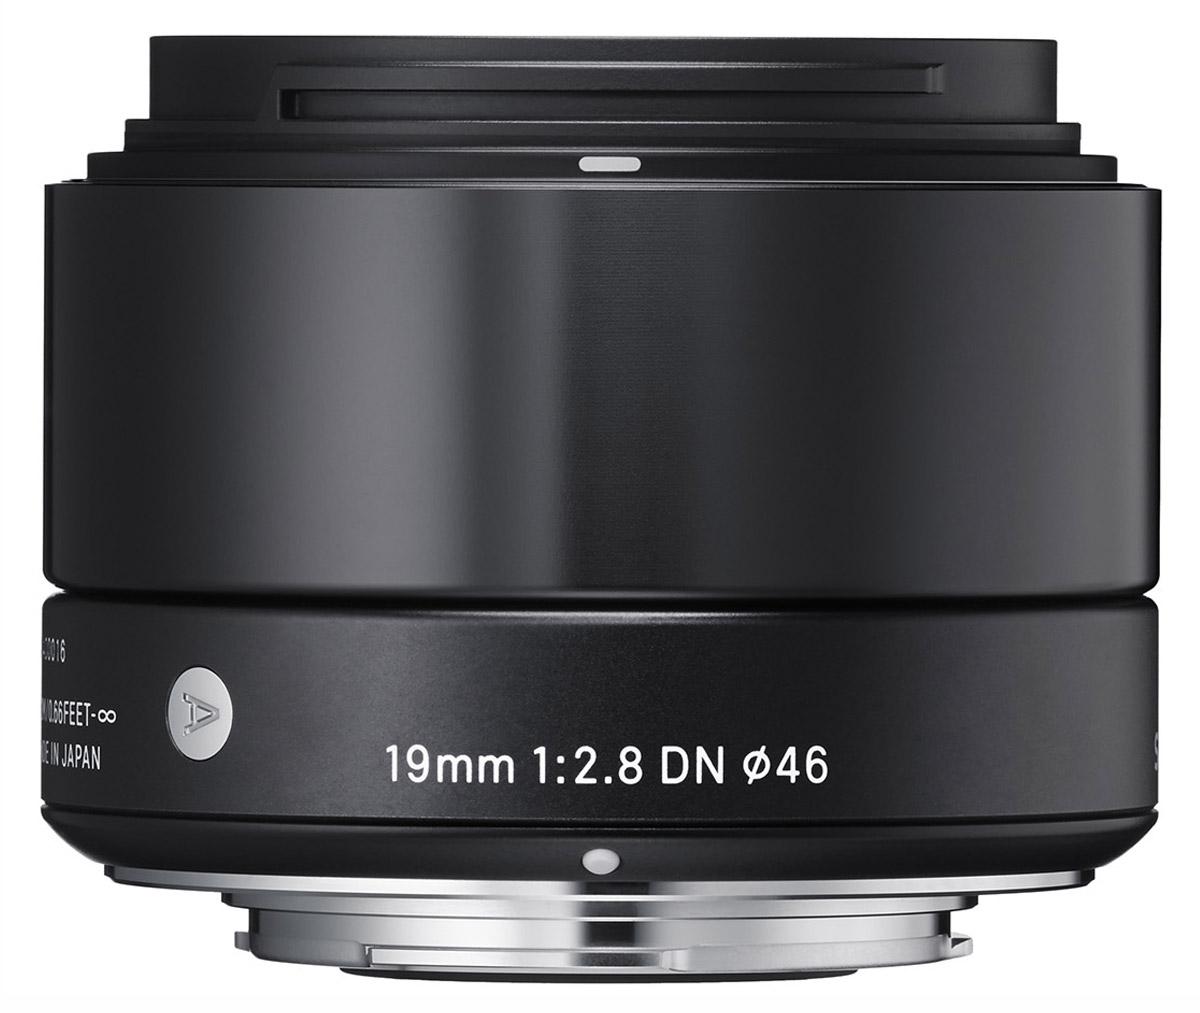 Sigma AF 19mm f/2.8 DN/A, Black широкоугольный объектив для Micro 4/3 - Объективы